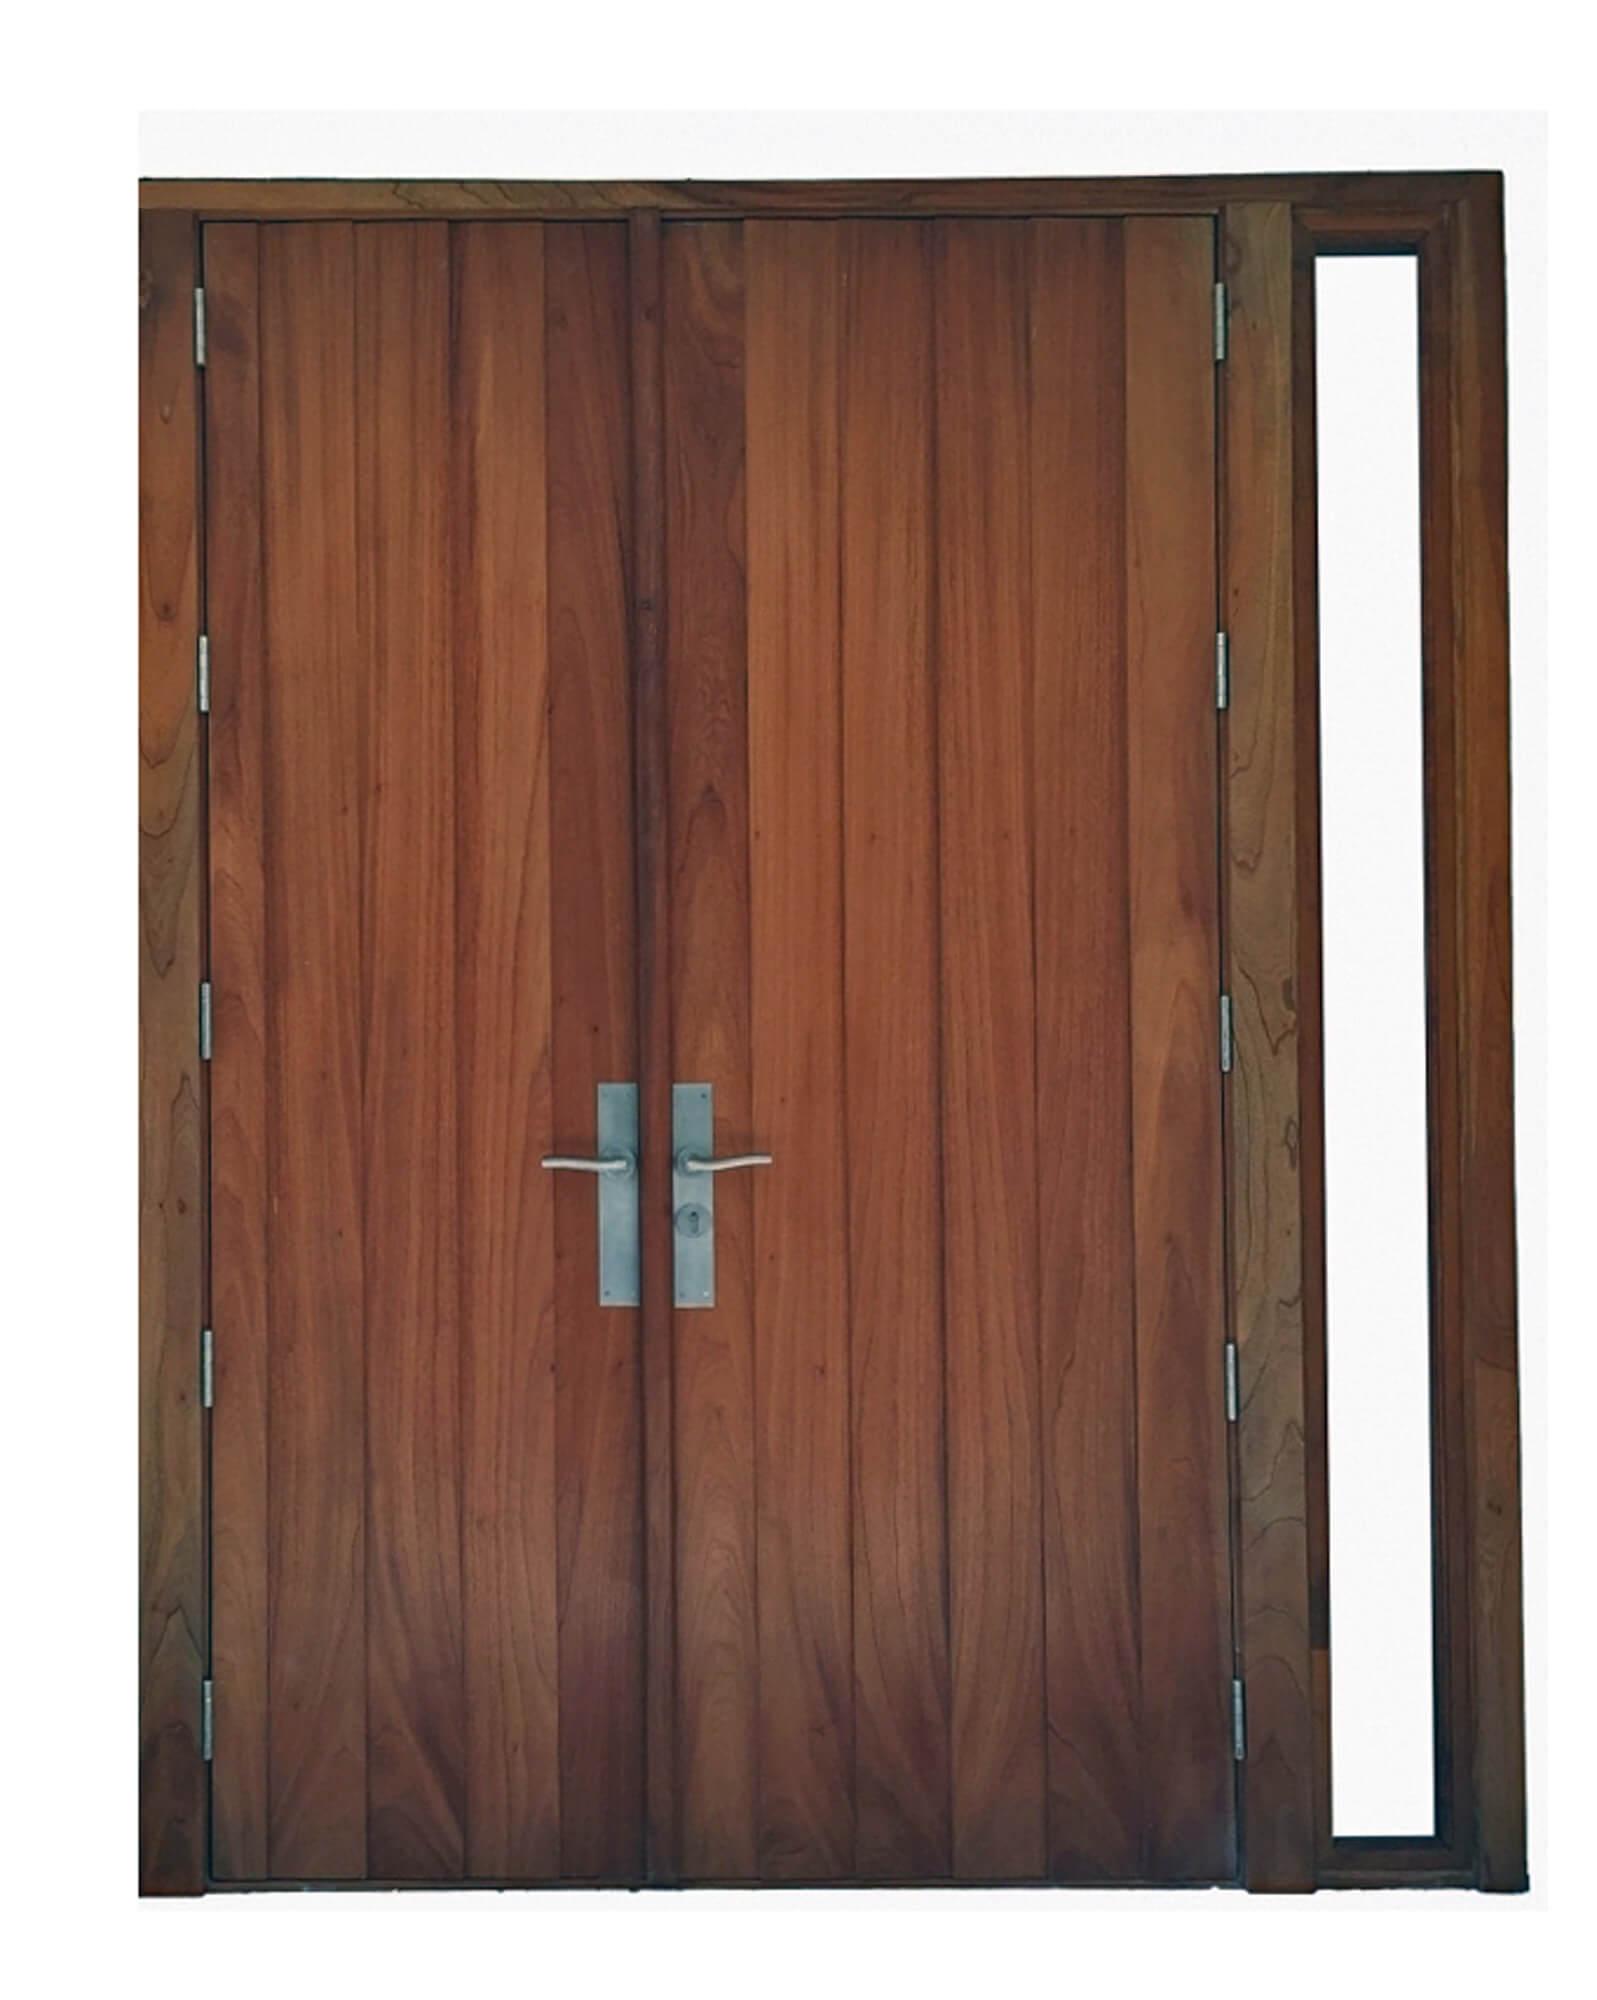 Key Biscayne Mahogany Door